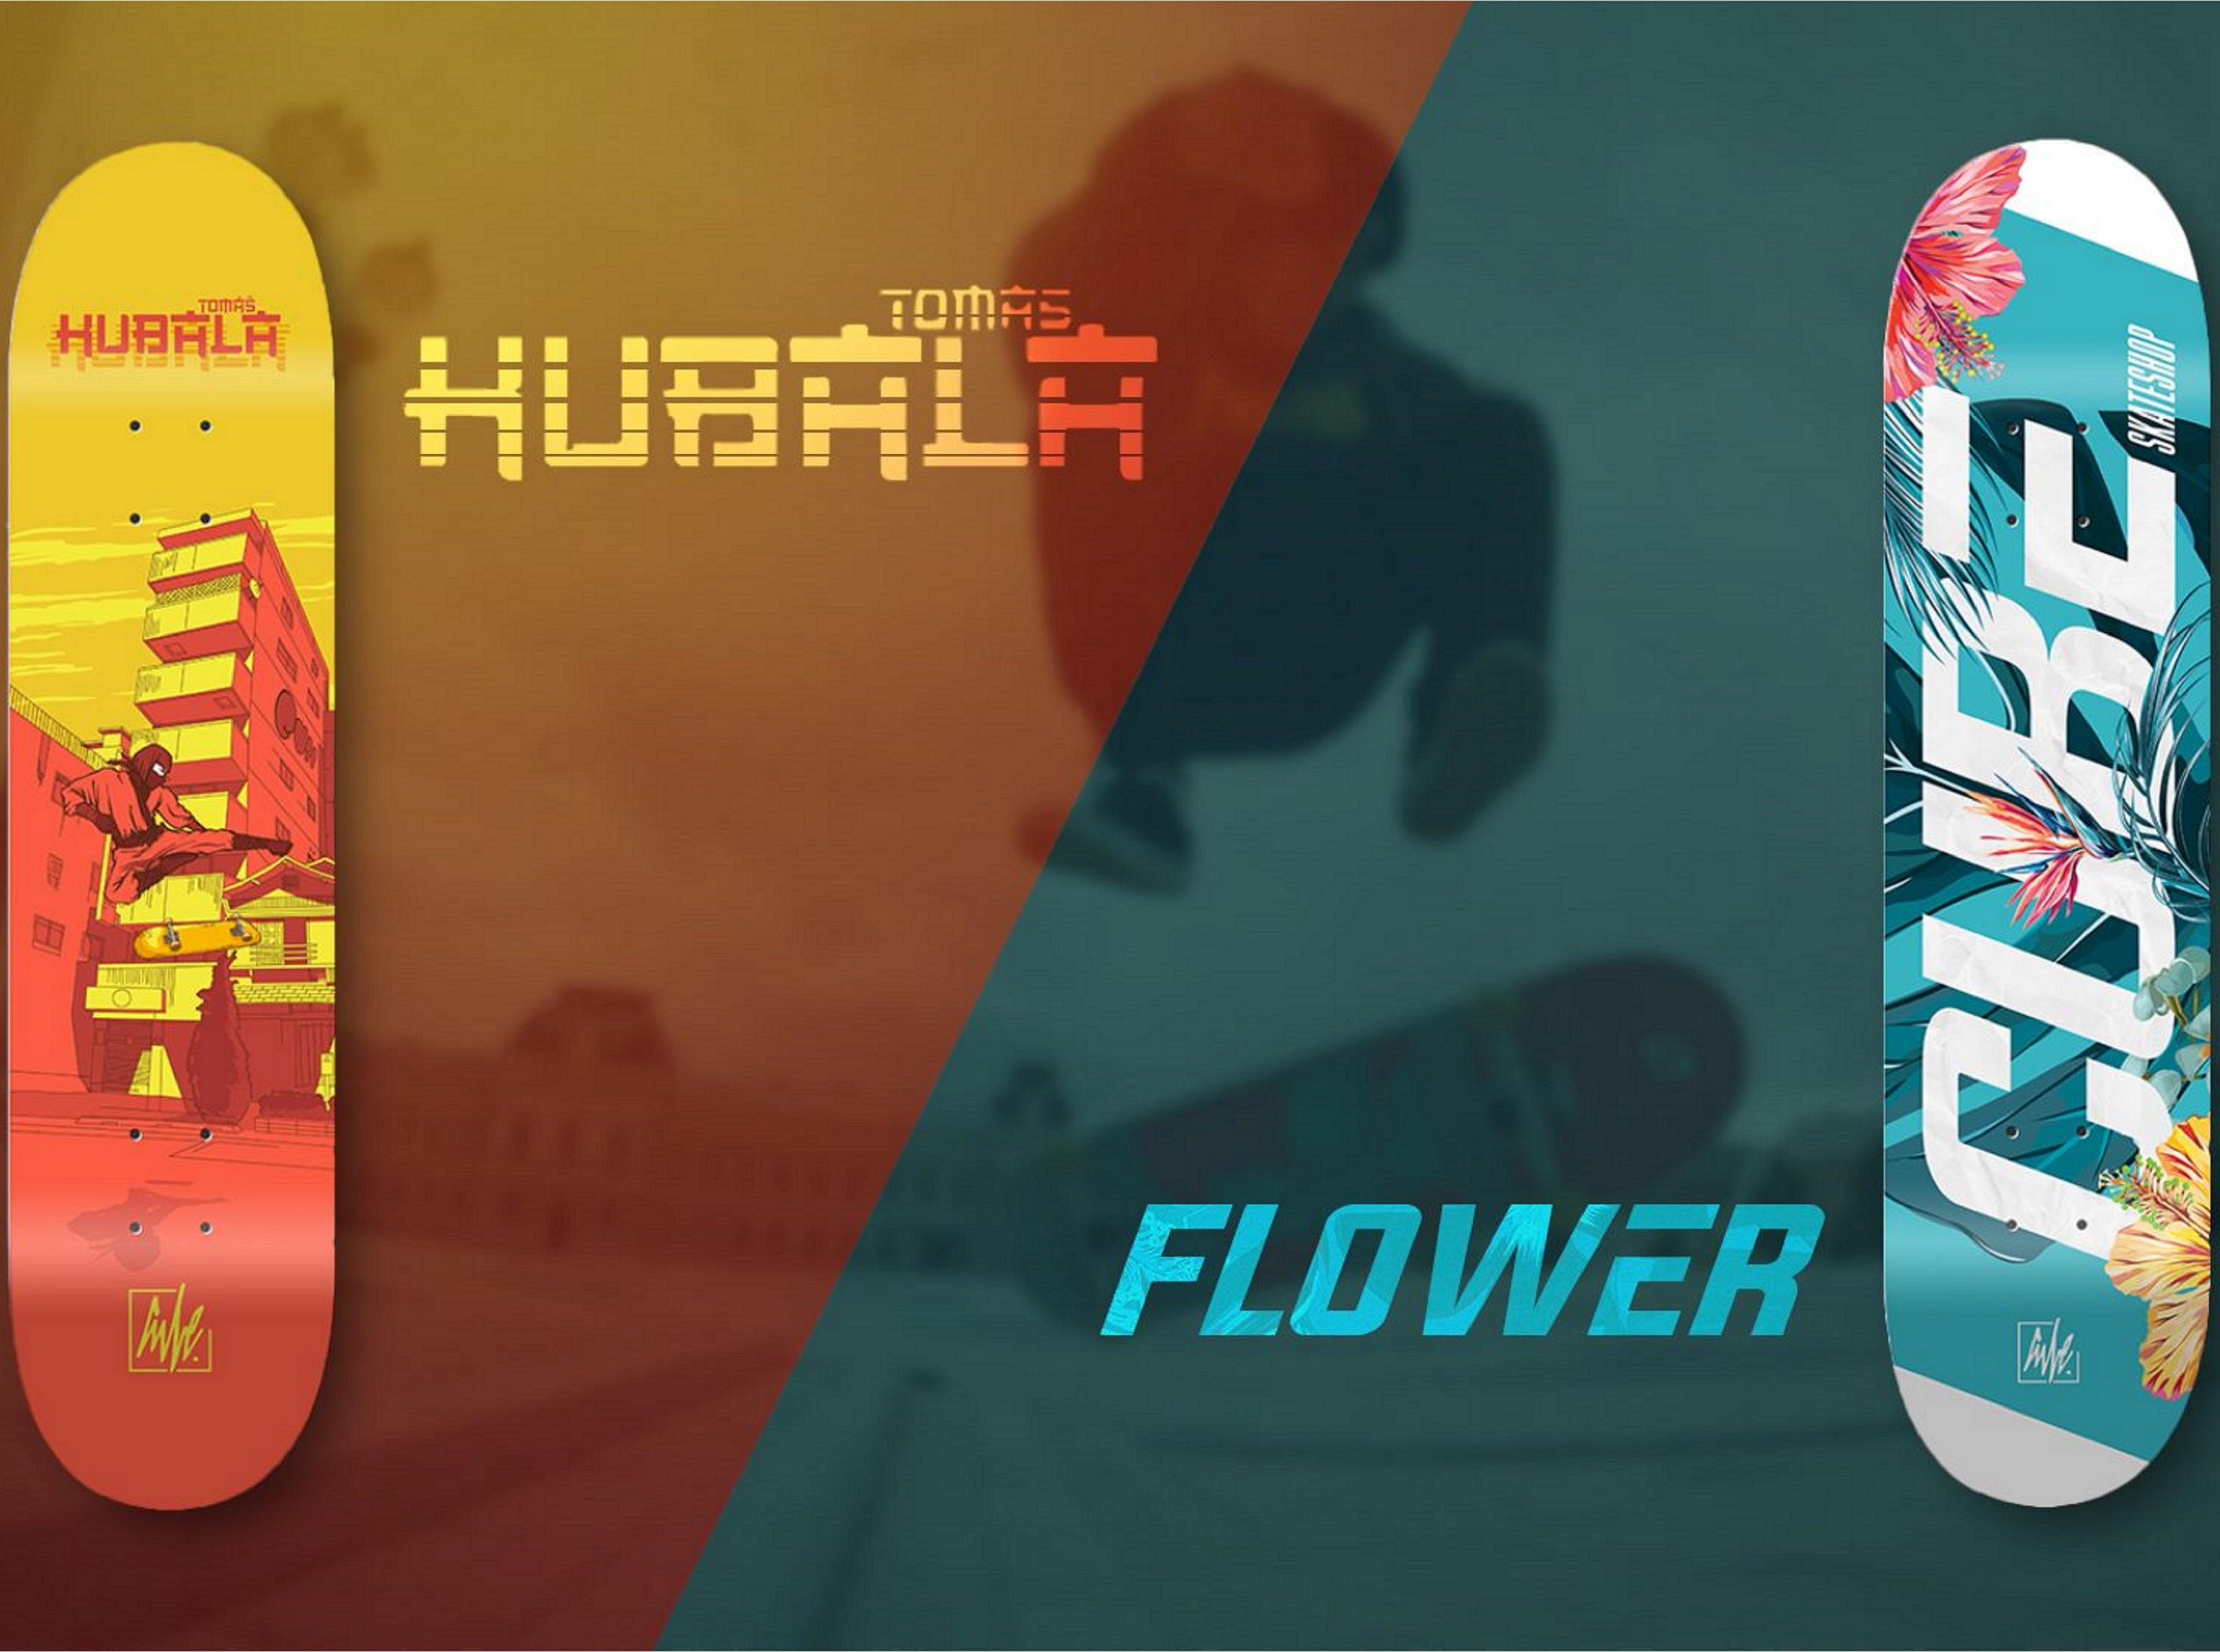 Cube Ninja a Flowers promo video!